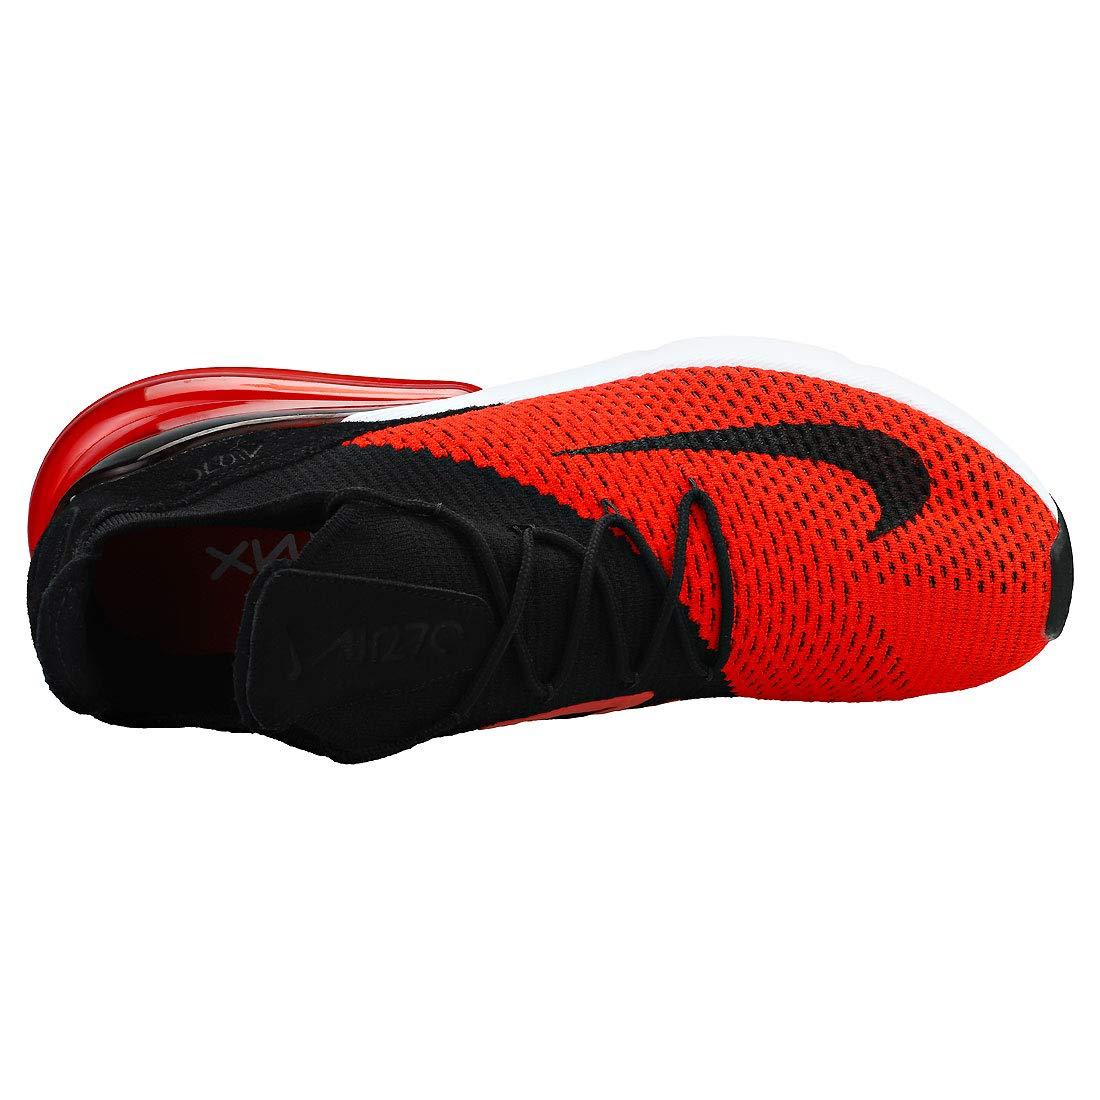 Nike Air Max 270 Flyknit Men's Chili RedBlackChallenge RedWhite Nylon Training Shoes 14 D(M) US